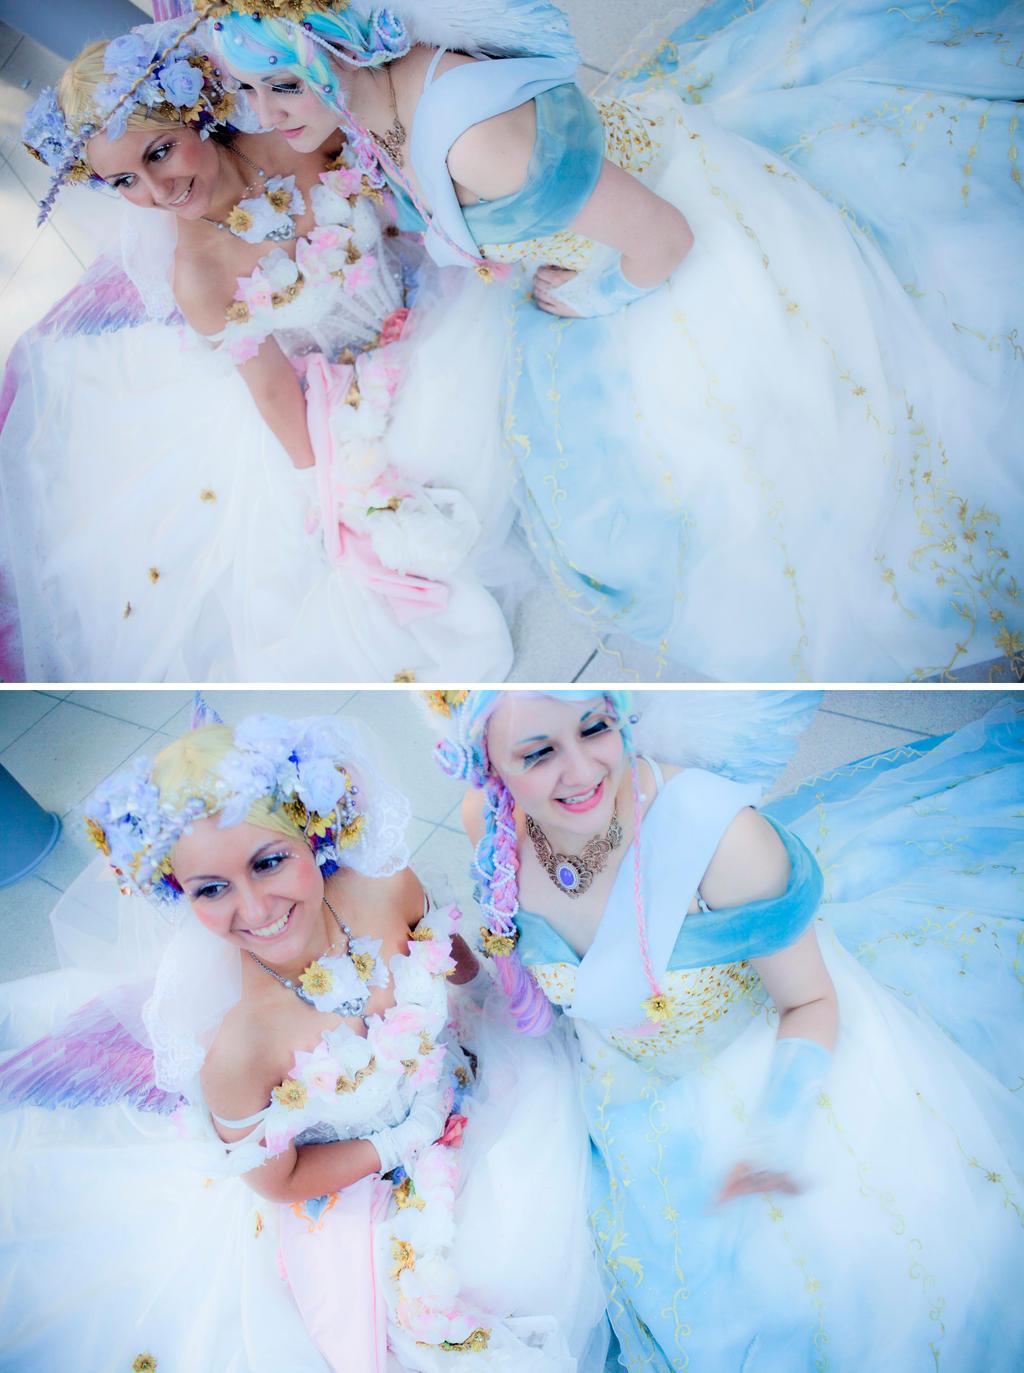 MLP: Princess Celestia and Princess Cadence 2 by Amapolchen